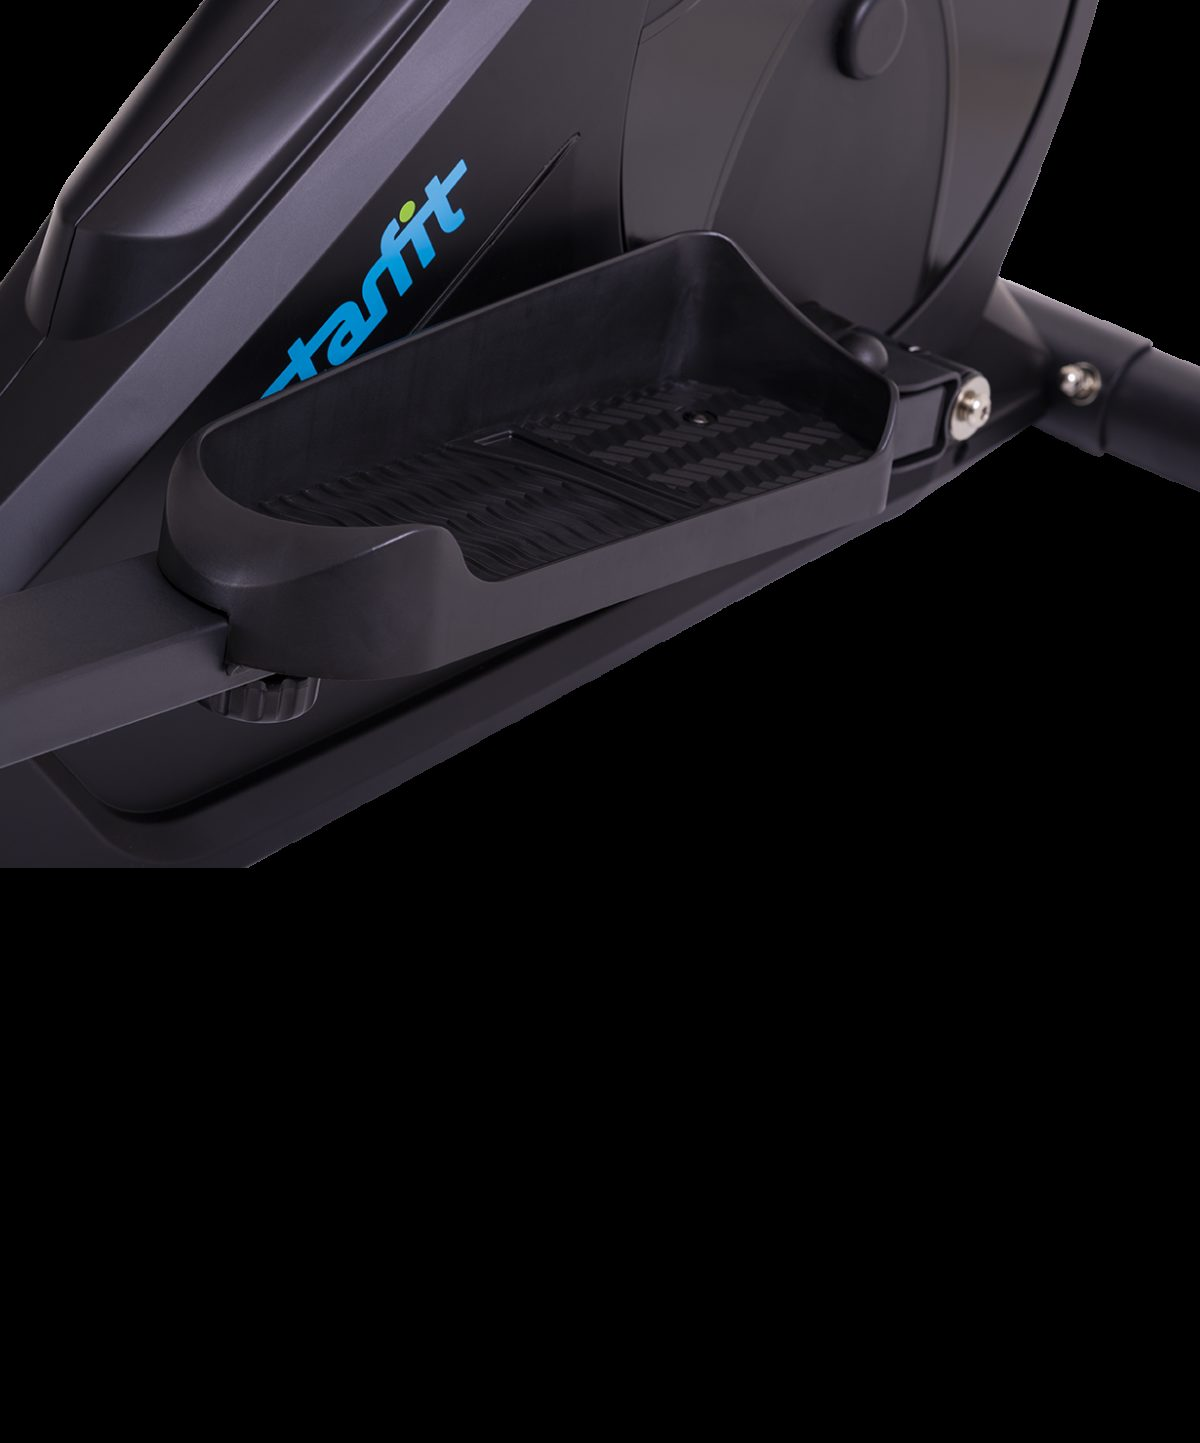 STARFIT Carrera New Эллиптический тренажер магнитный  VE-105 - 5